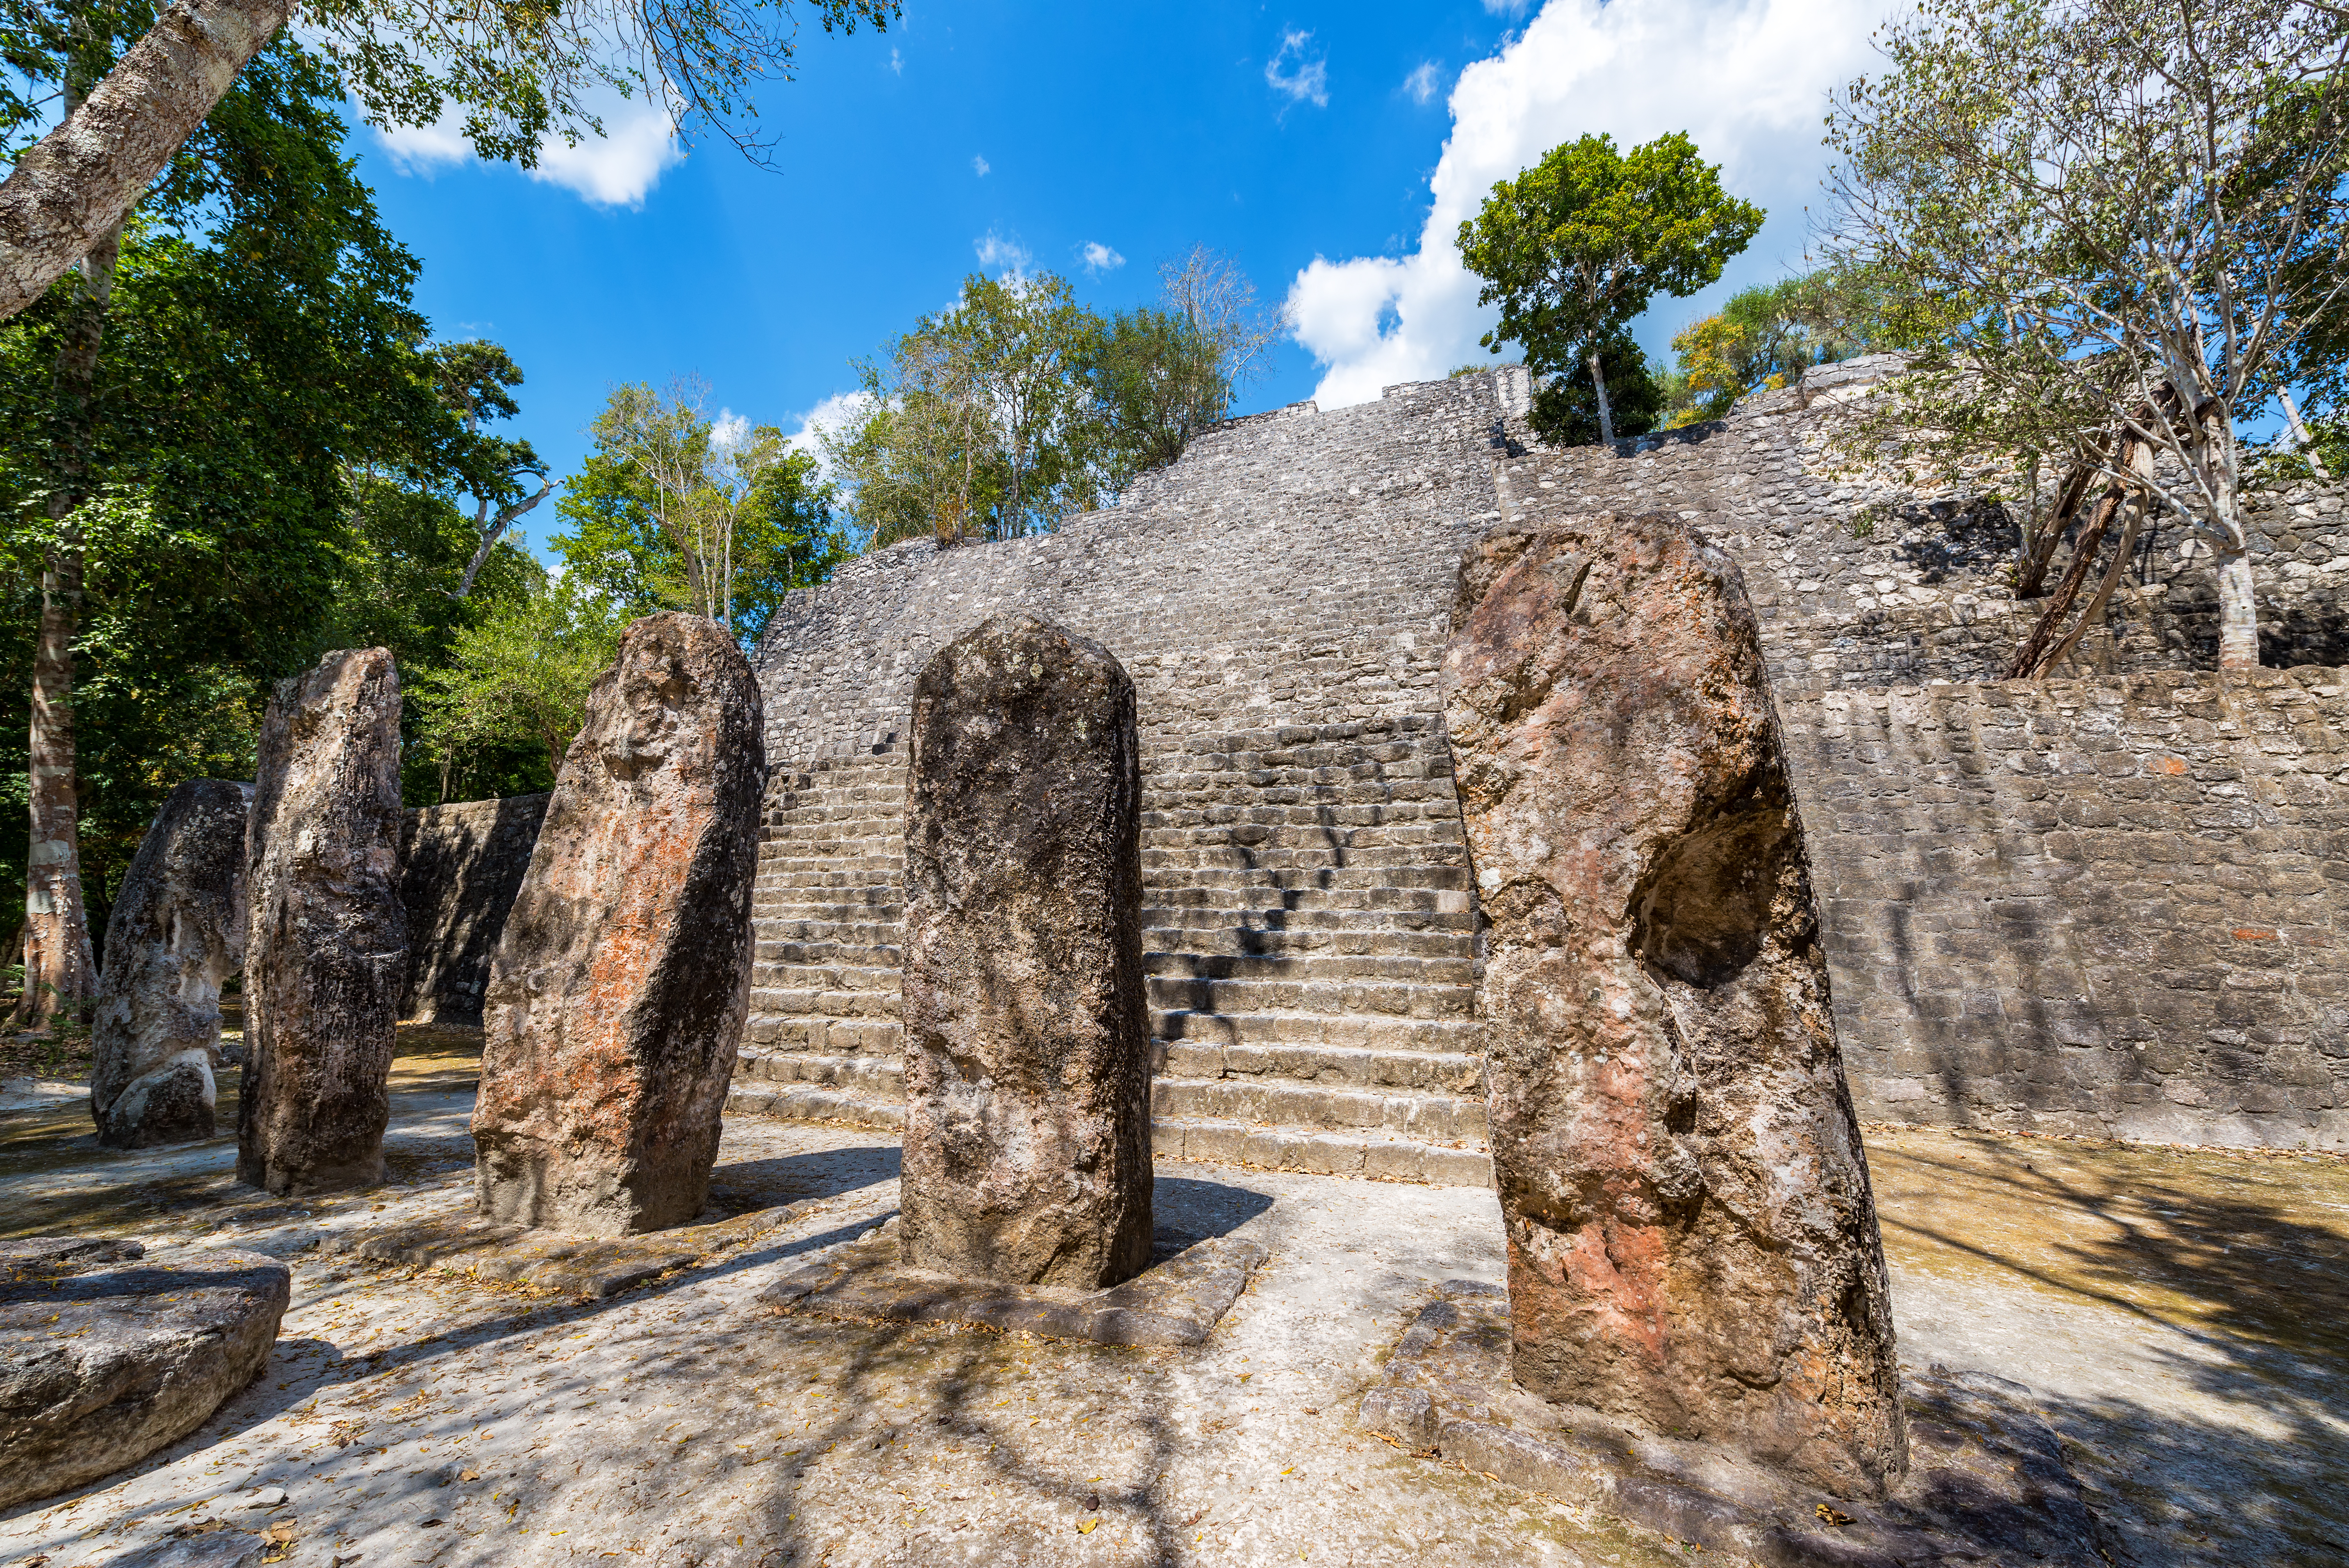 shutterstock_calakmul-mexique